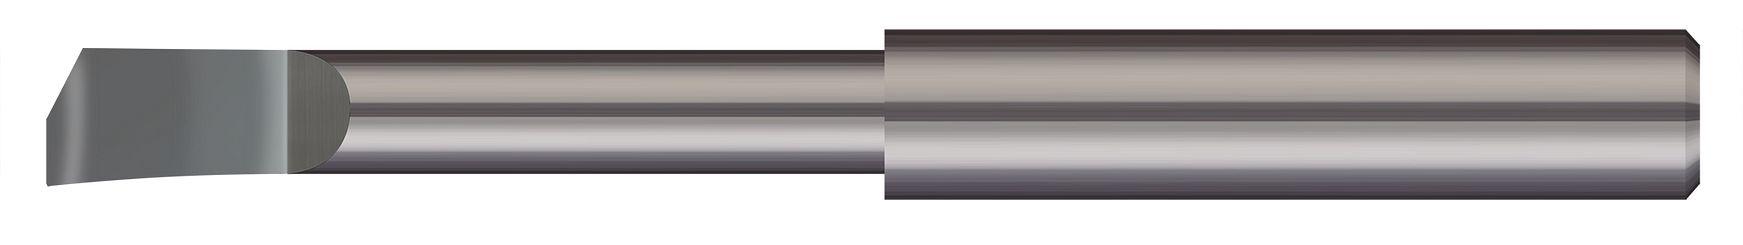 Standard - Boring Tools - Helical Back Rake